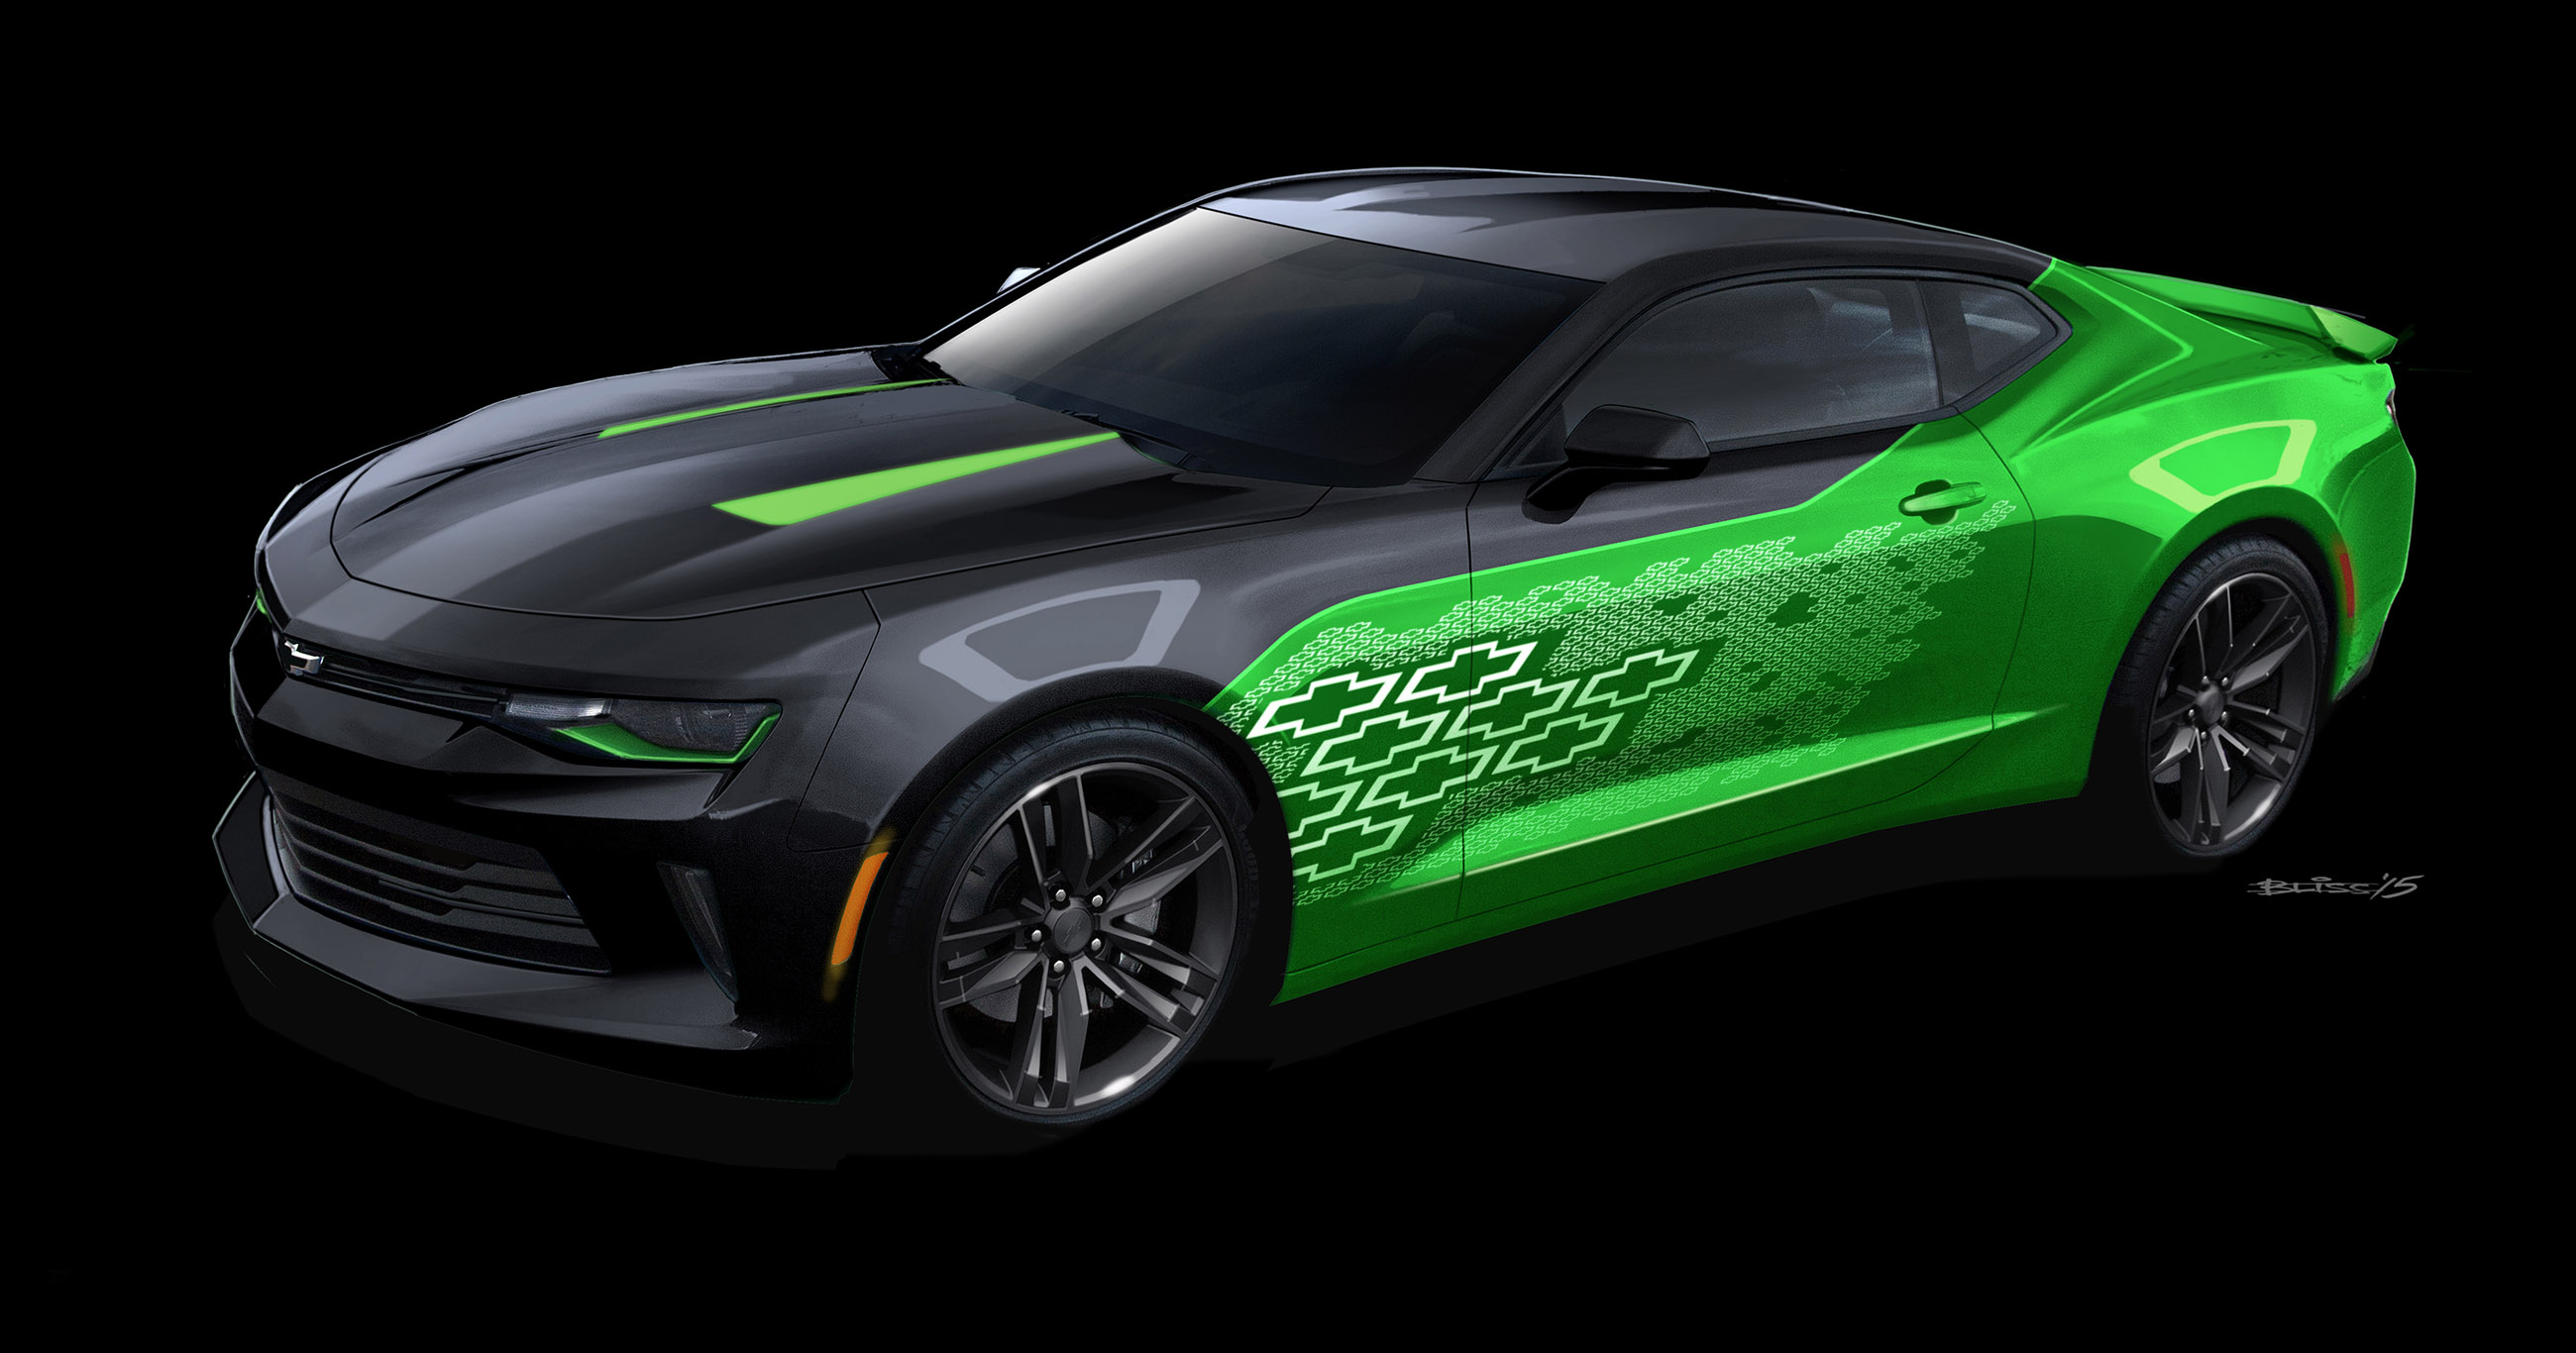 2016 Chevrolet Camaro Krypton concept